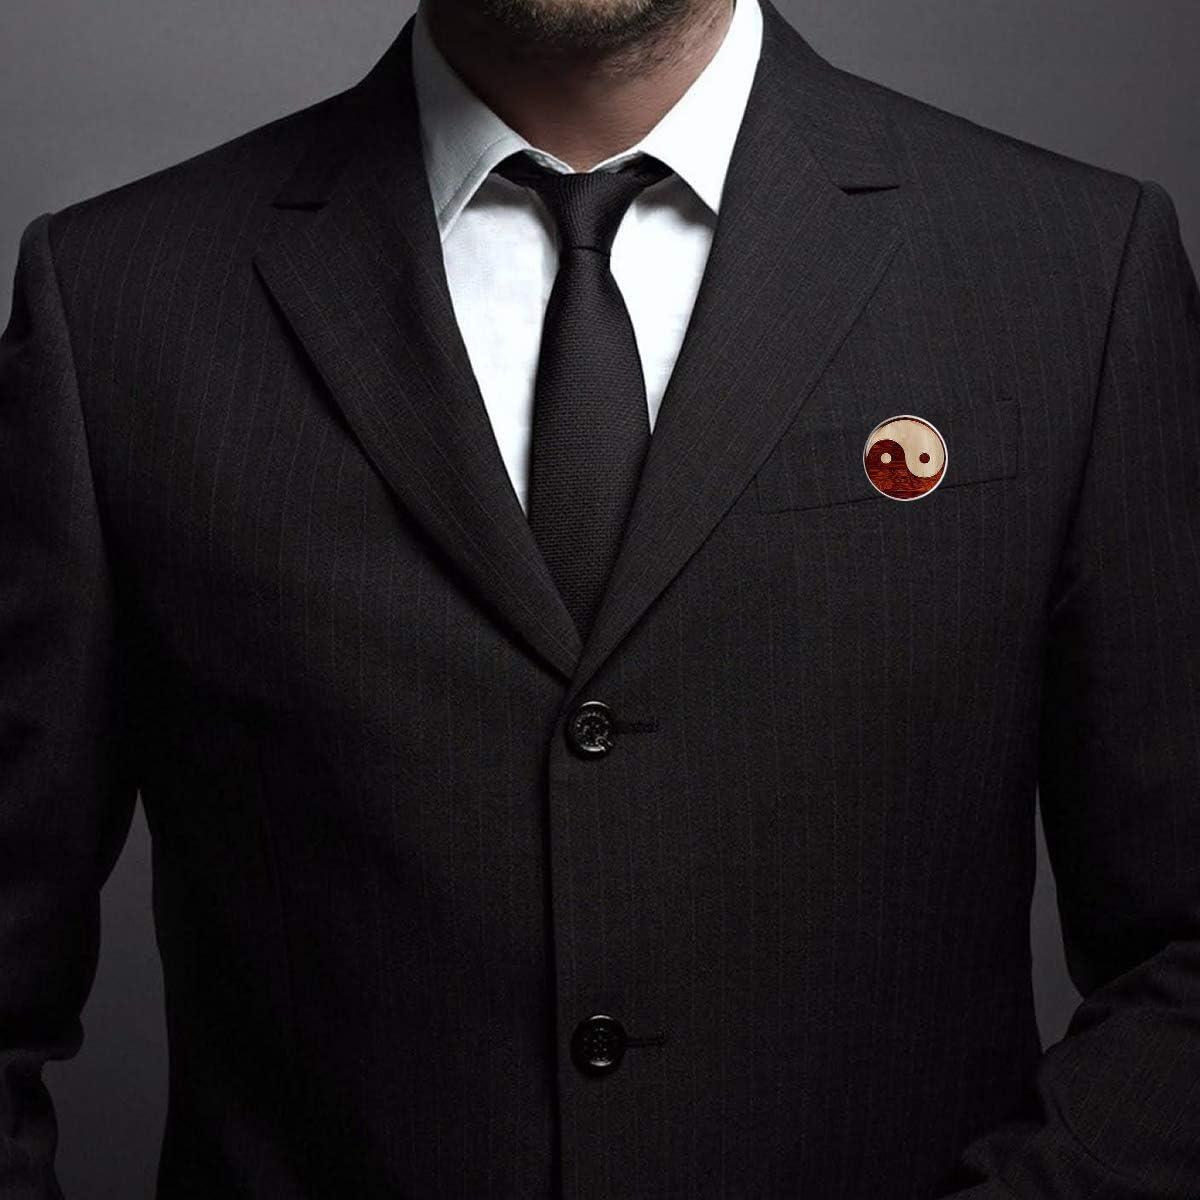 Pinback Buttons Badges Pins Yin Yang Brown Lapel Pin Brooch Clip Trendy Accessory Jacket T-Shirt Bag Hat Shoe